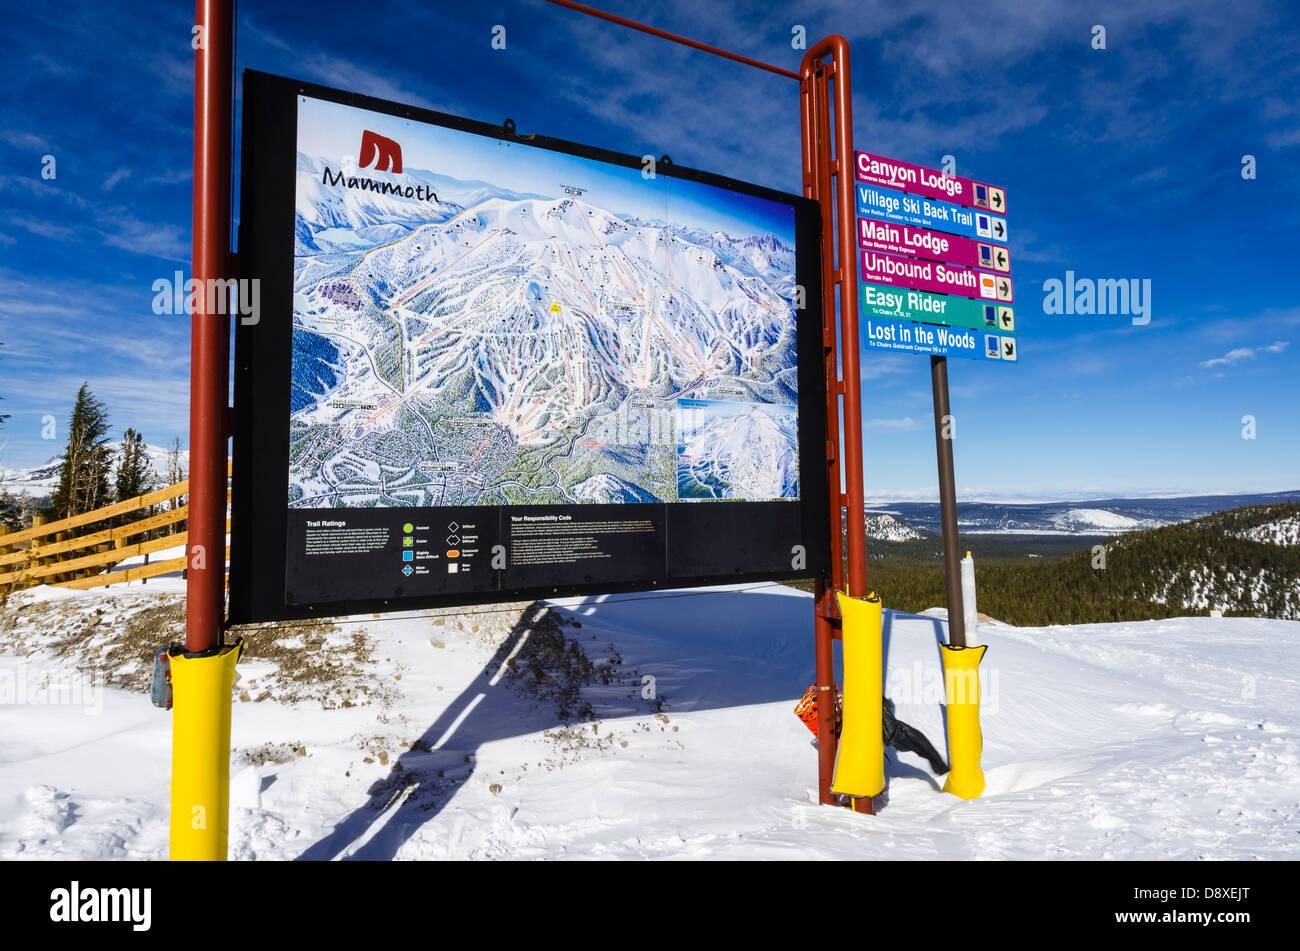 Skiing In California Map.Trail Map Mammoth Mountain Ski Area Mammoth Lakes California Usa